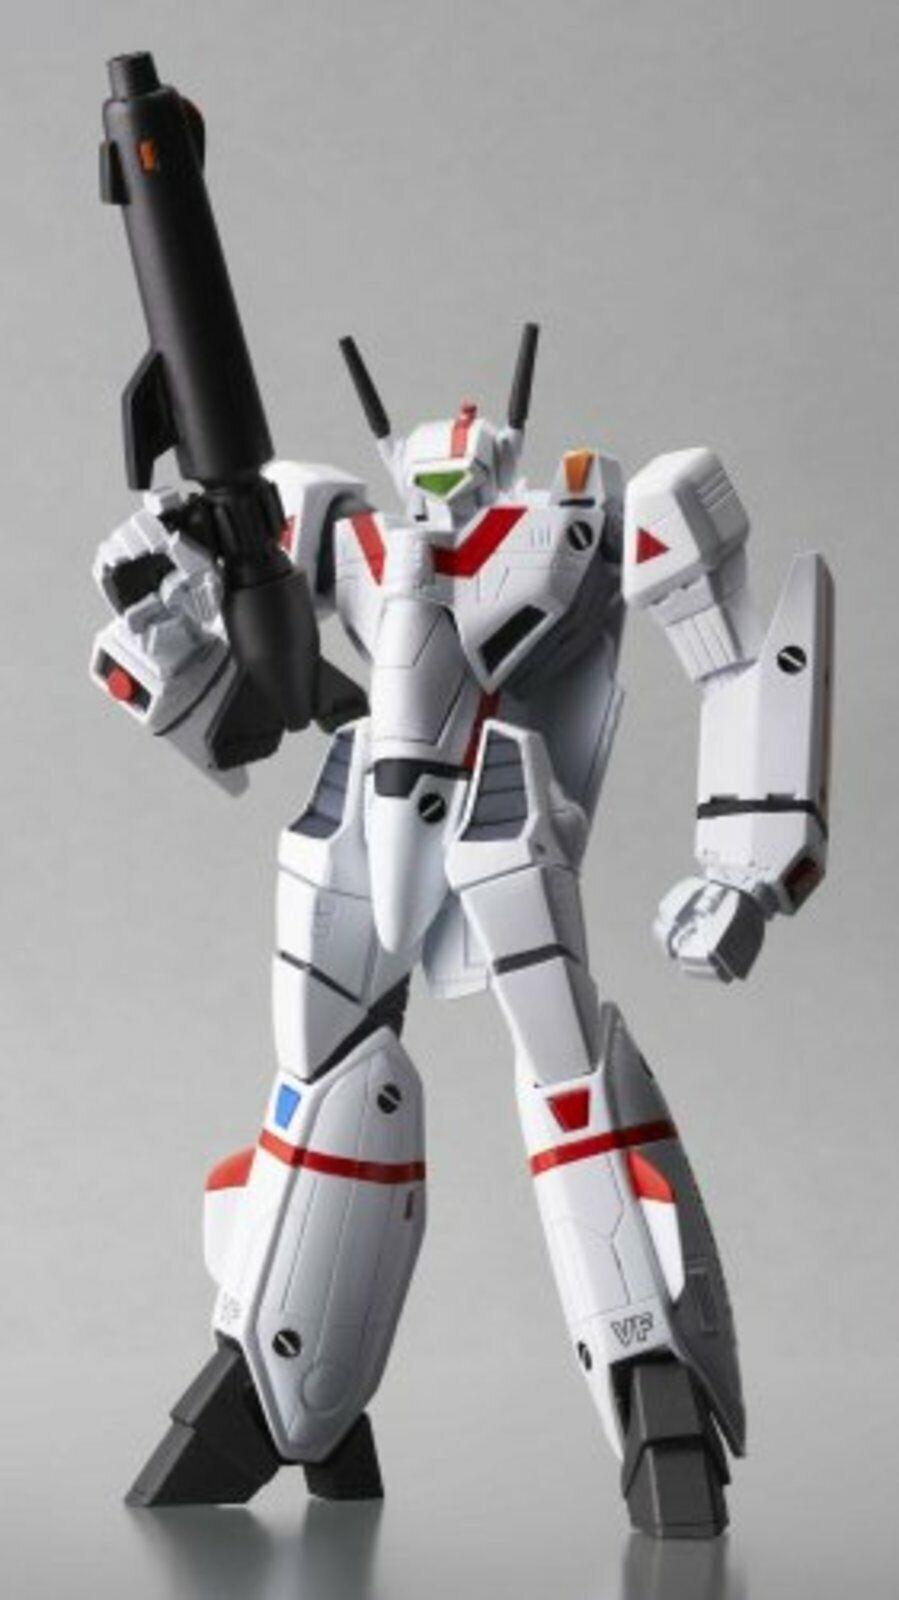 Revoltech Macross Valkyrie VF-1J la figura Robotech (juguete) F s con seguimiento Japón